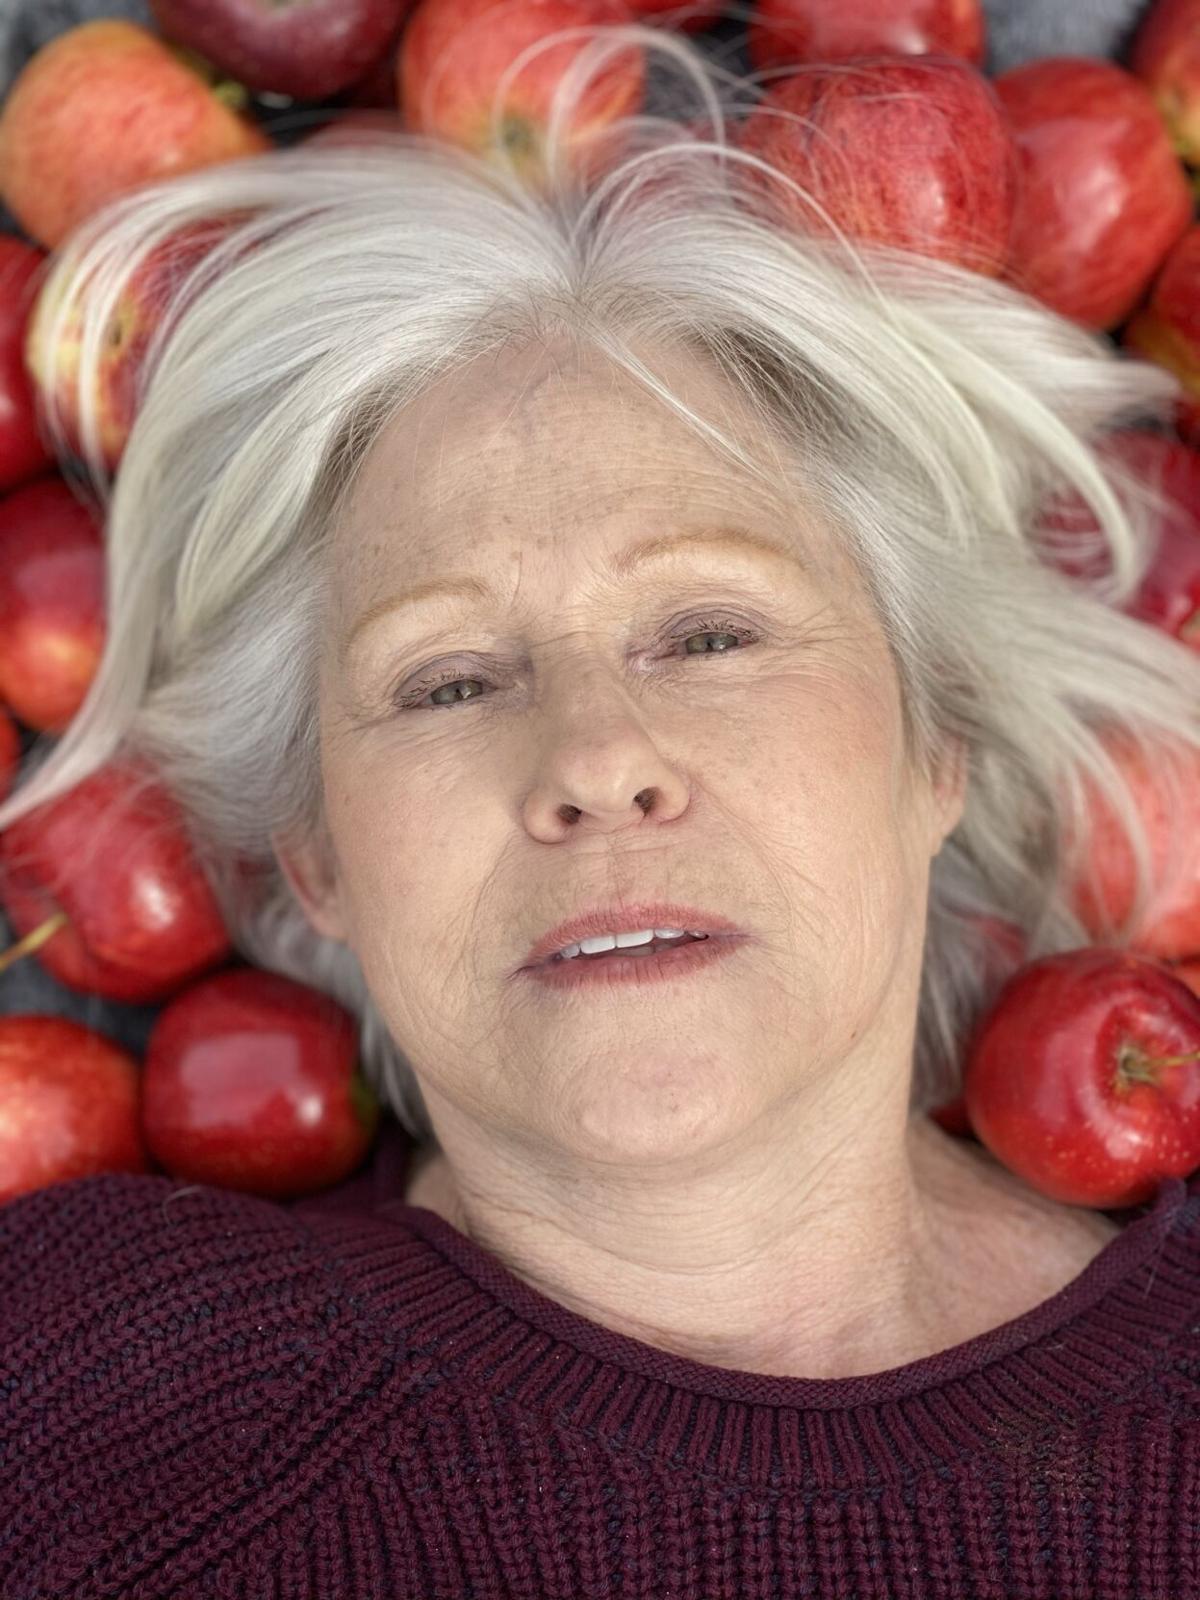 111620 apples.jpeg